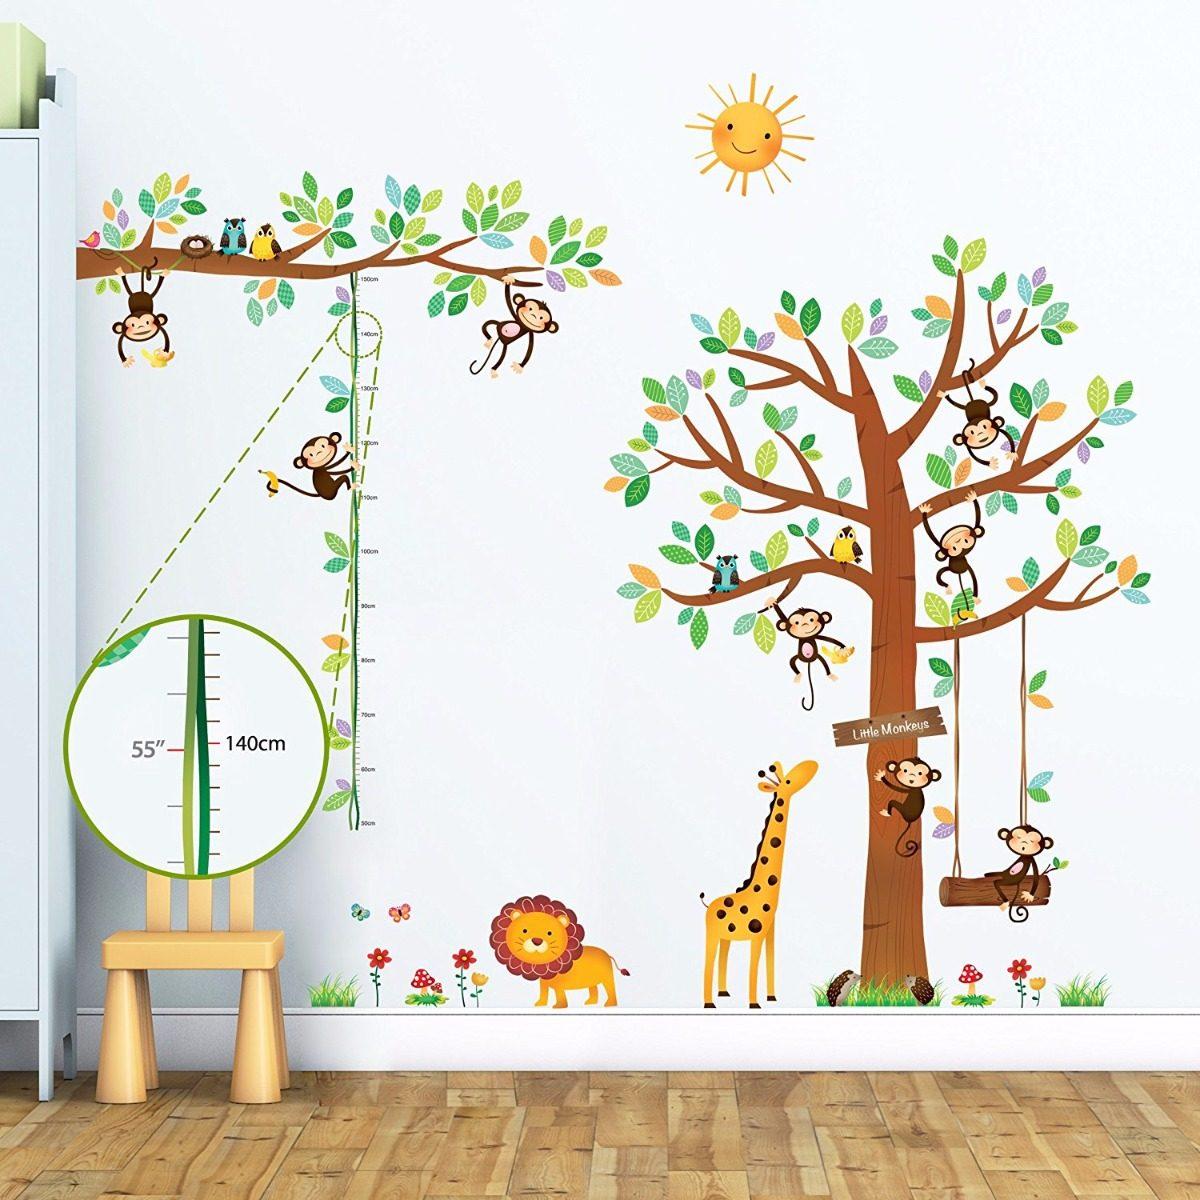 calcomania para pared de rbol animales decoraci n ni os en mercado libre. Black Bedroom Furniture Sets. Home Design Ideas